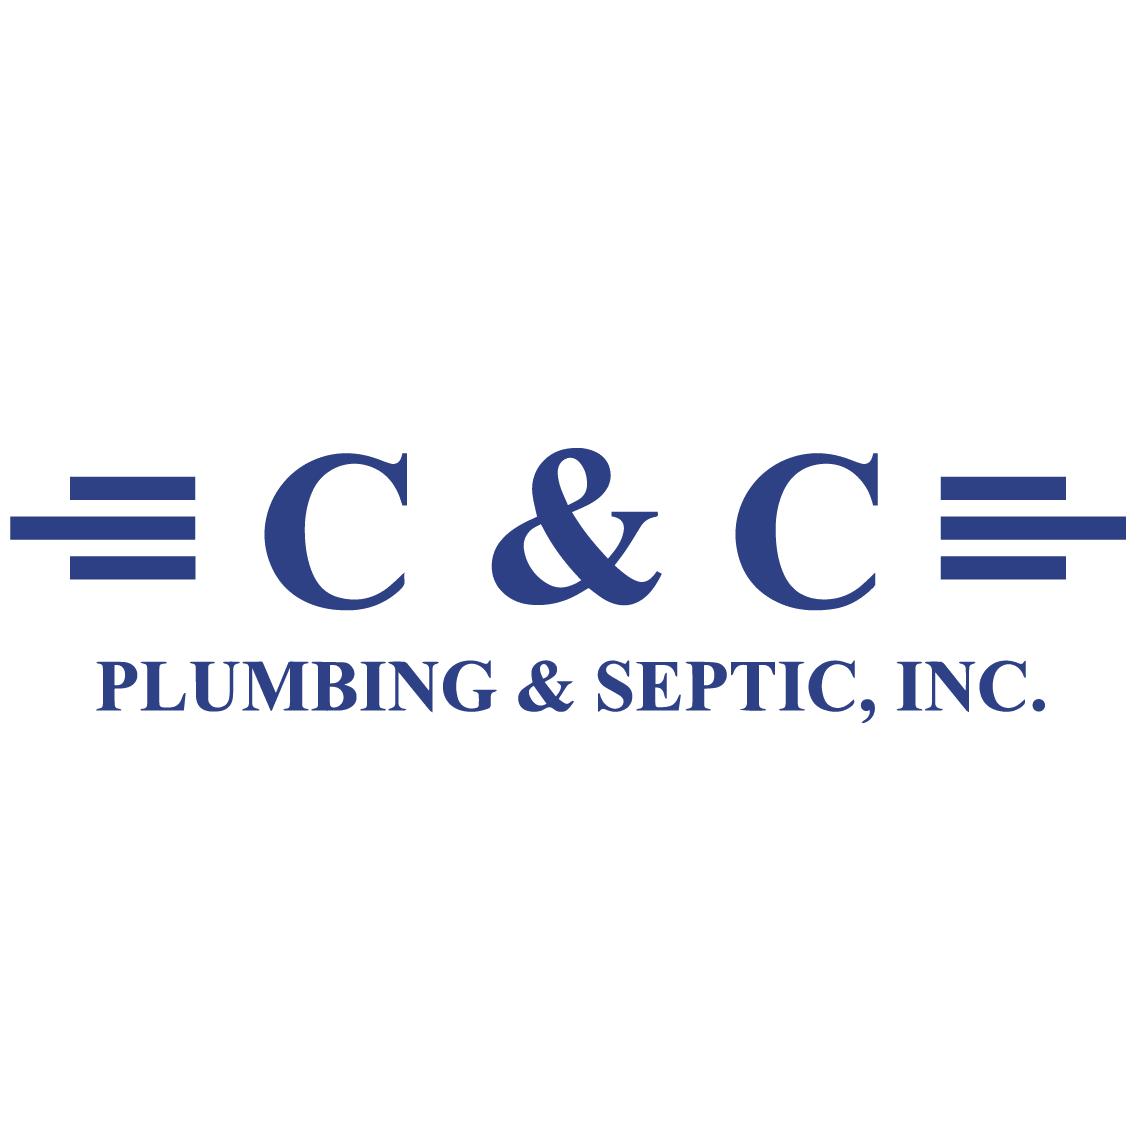 C & C Plumbing & Septic Inc